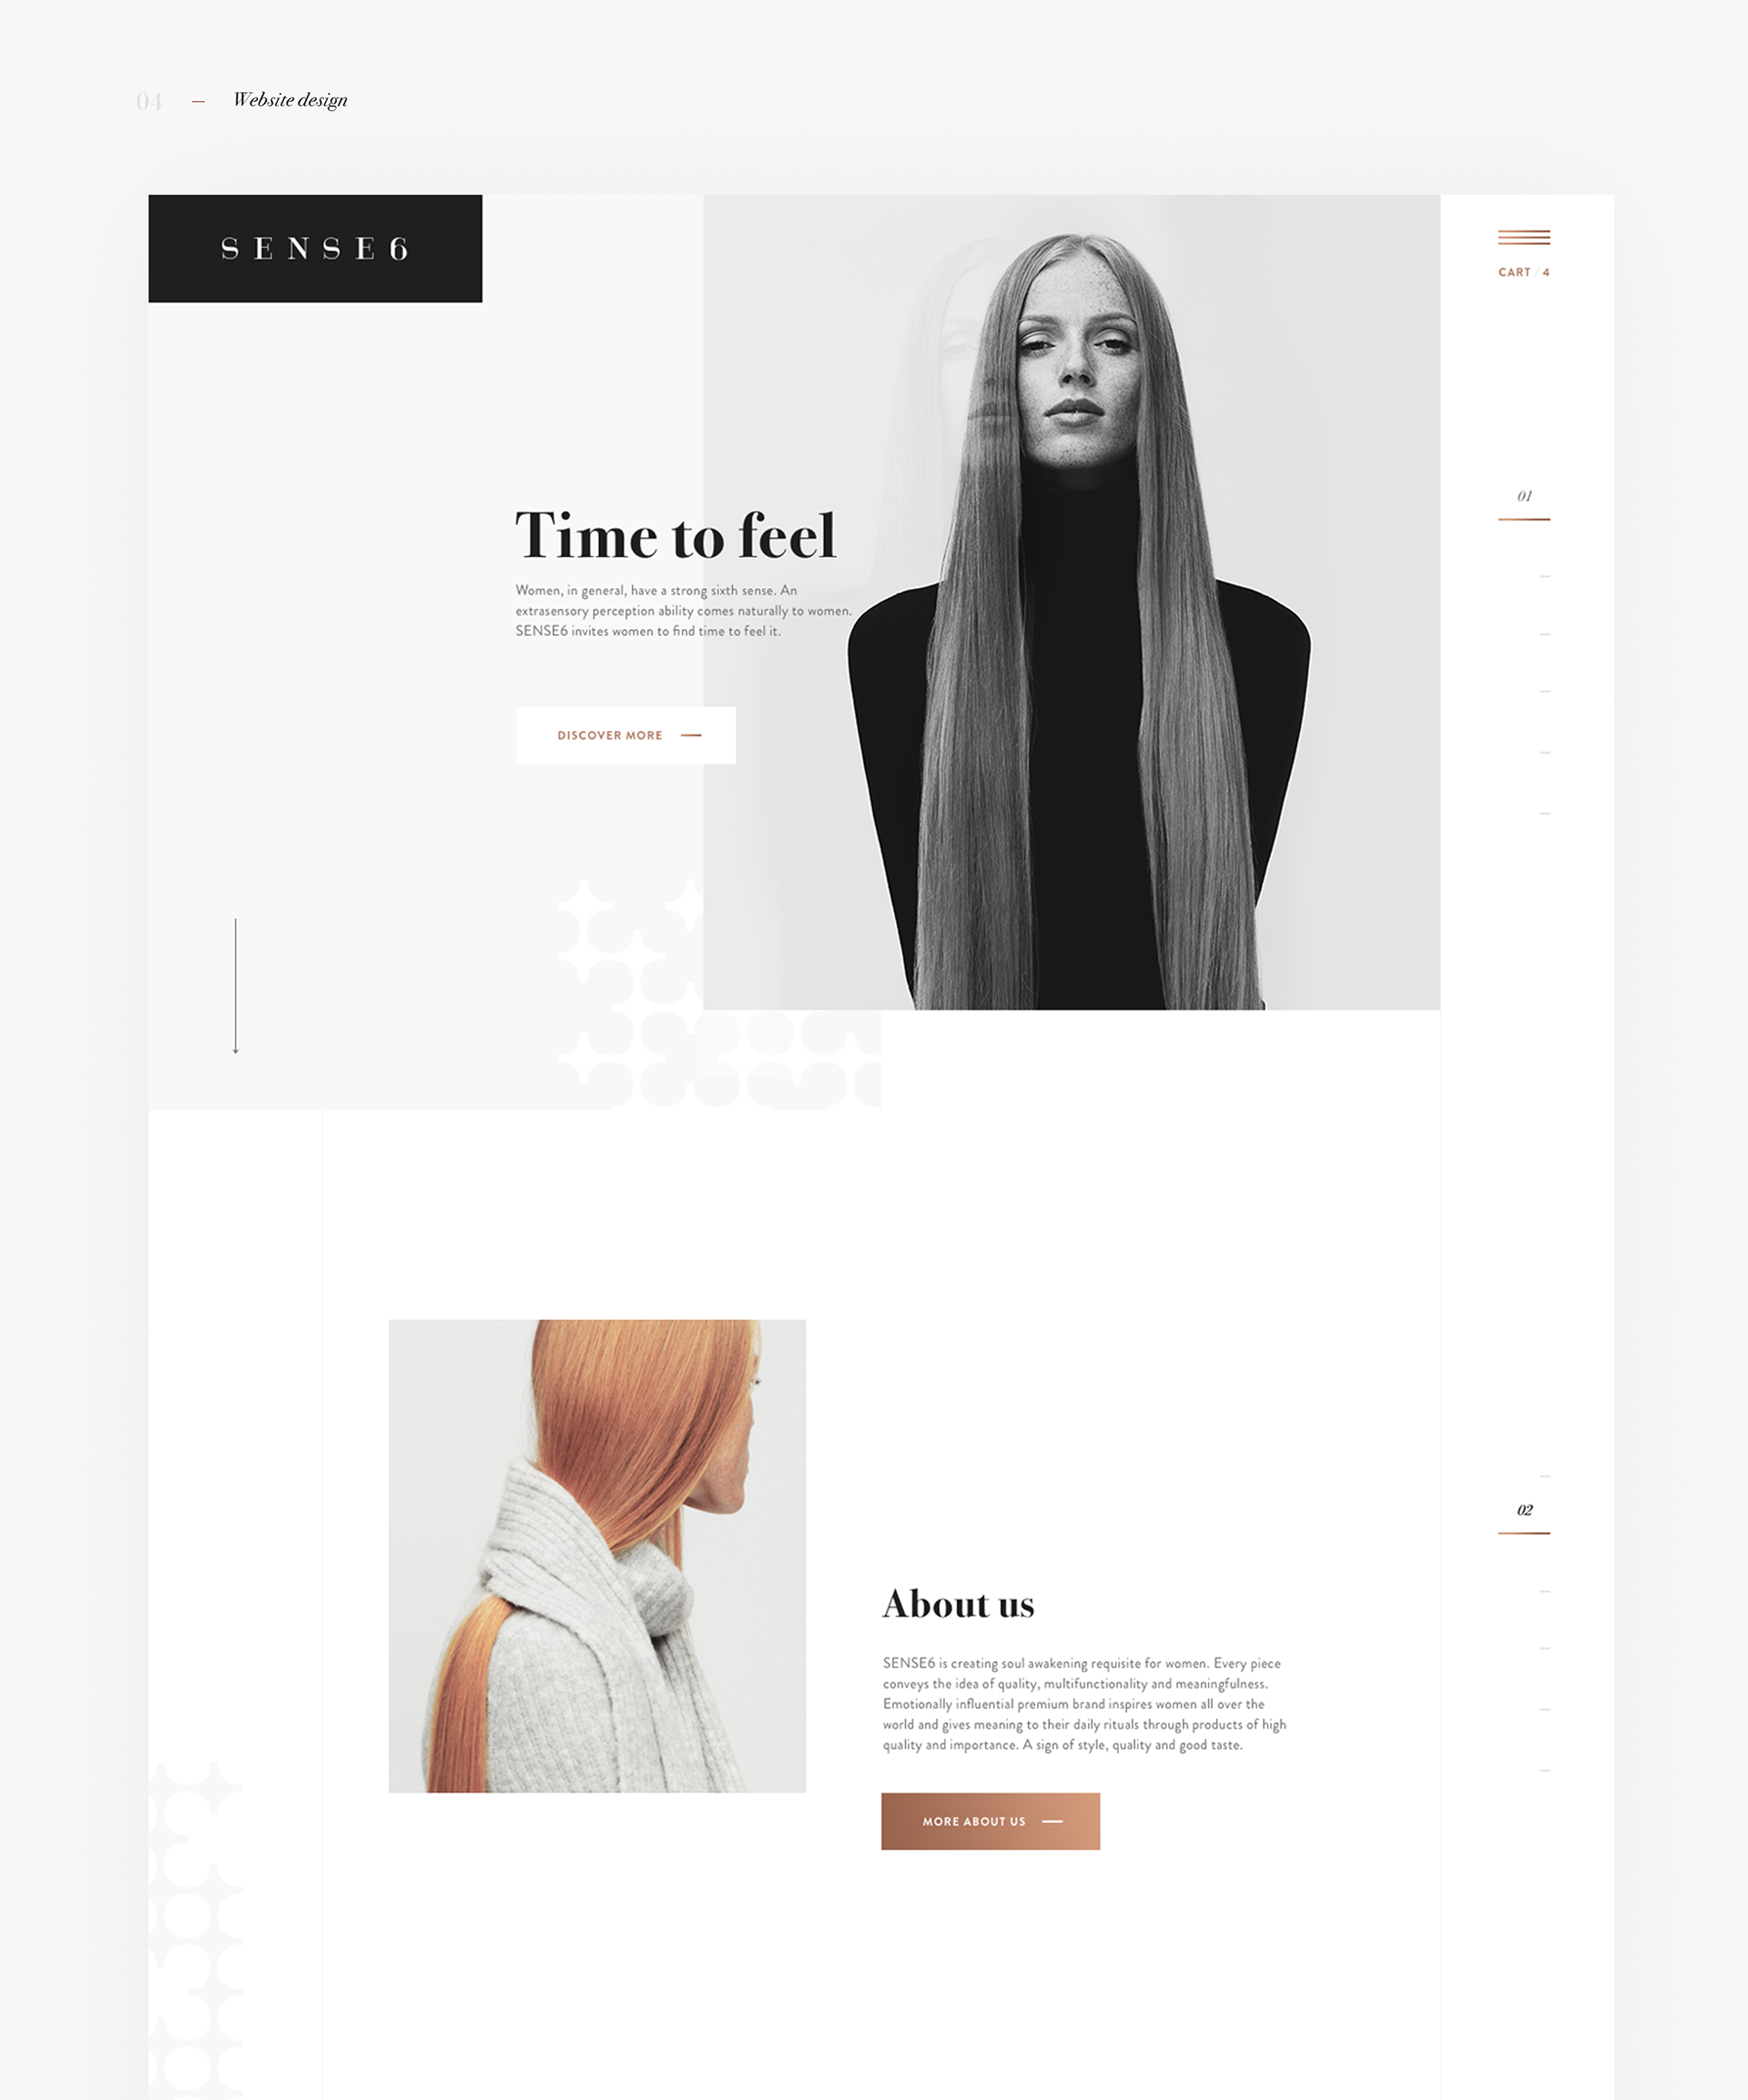 Web Design: Sense6 Fashion Website Design